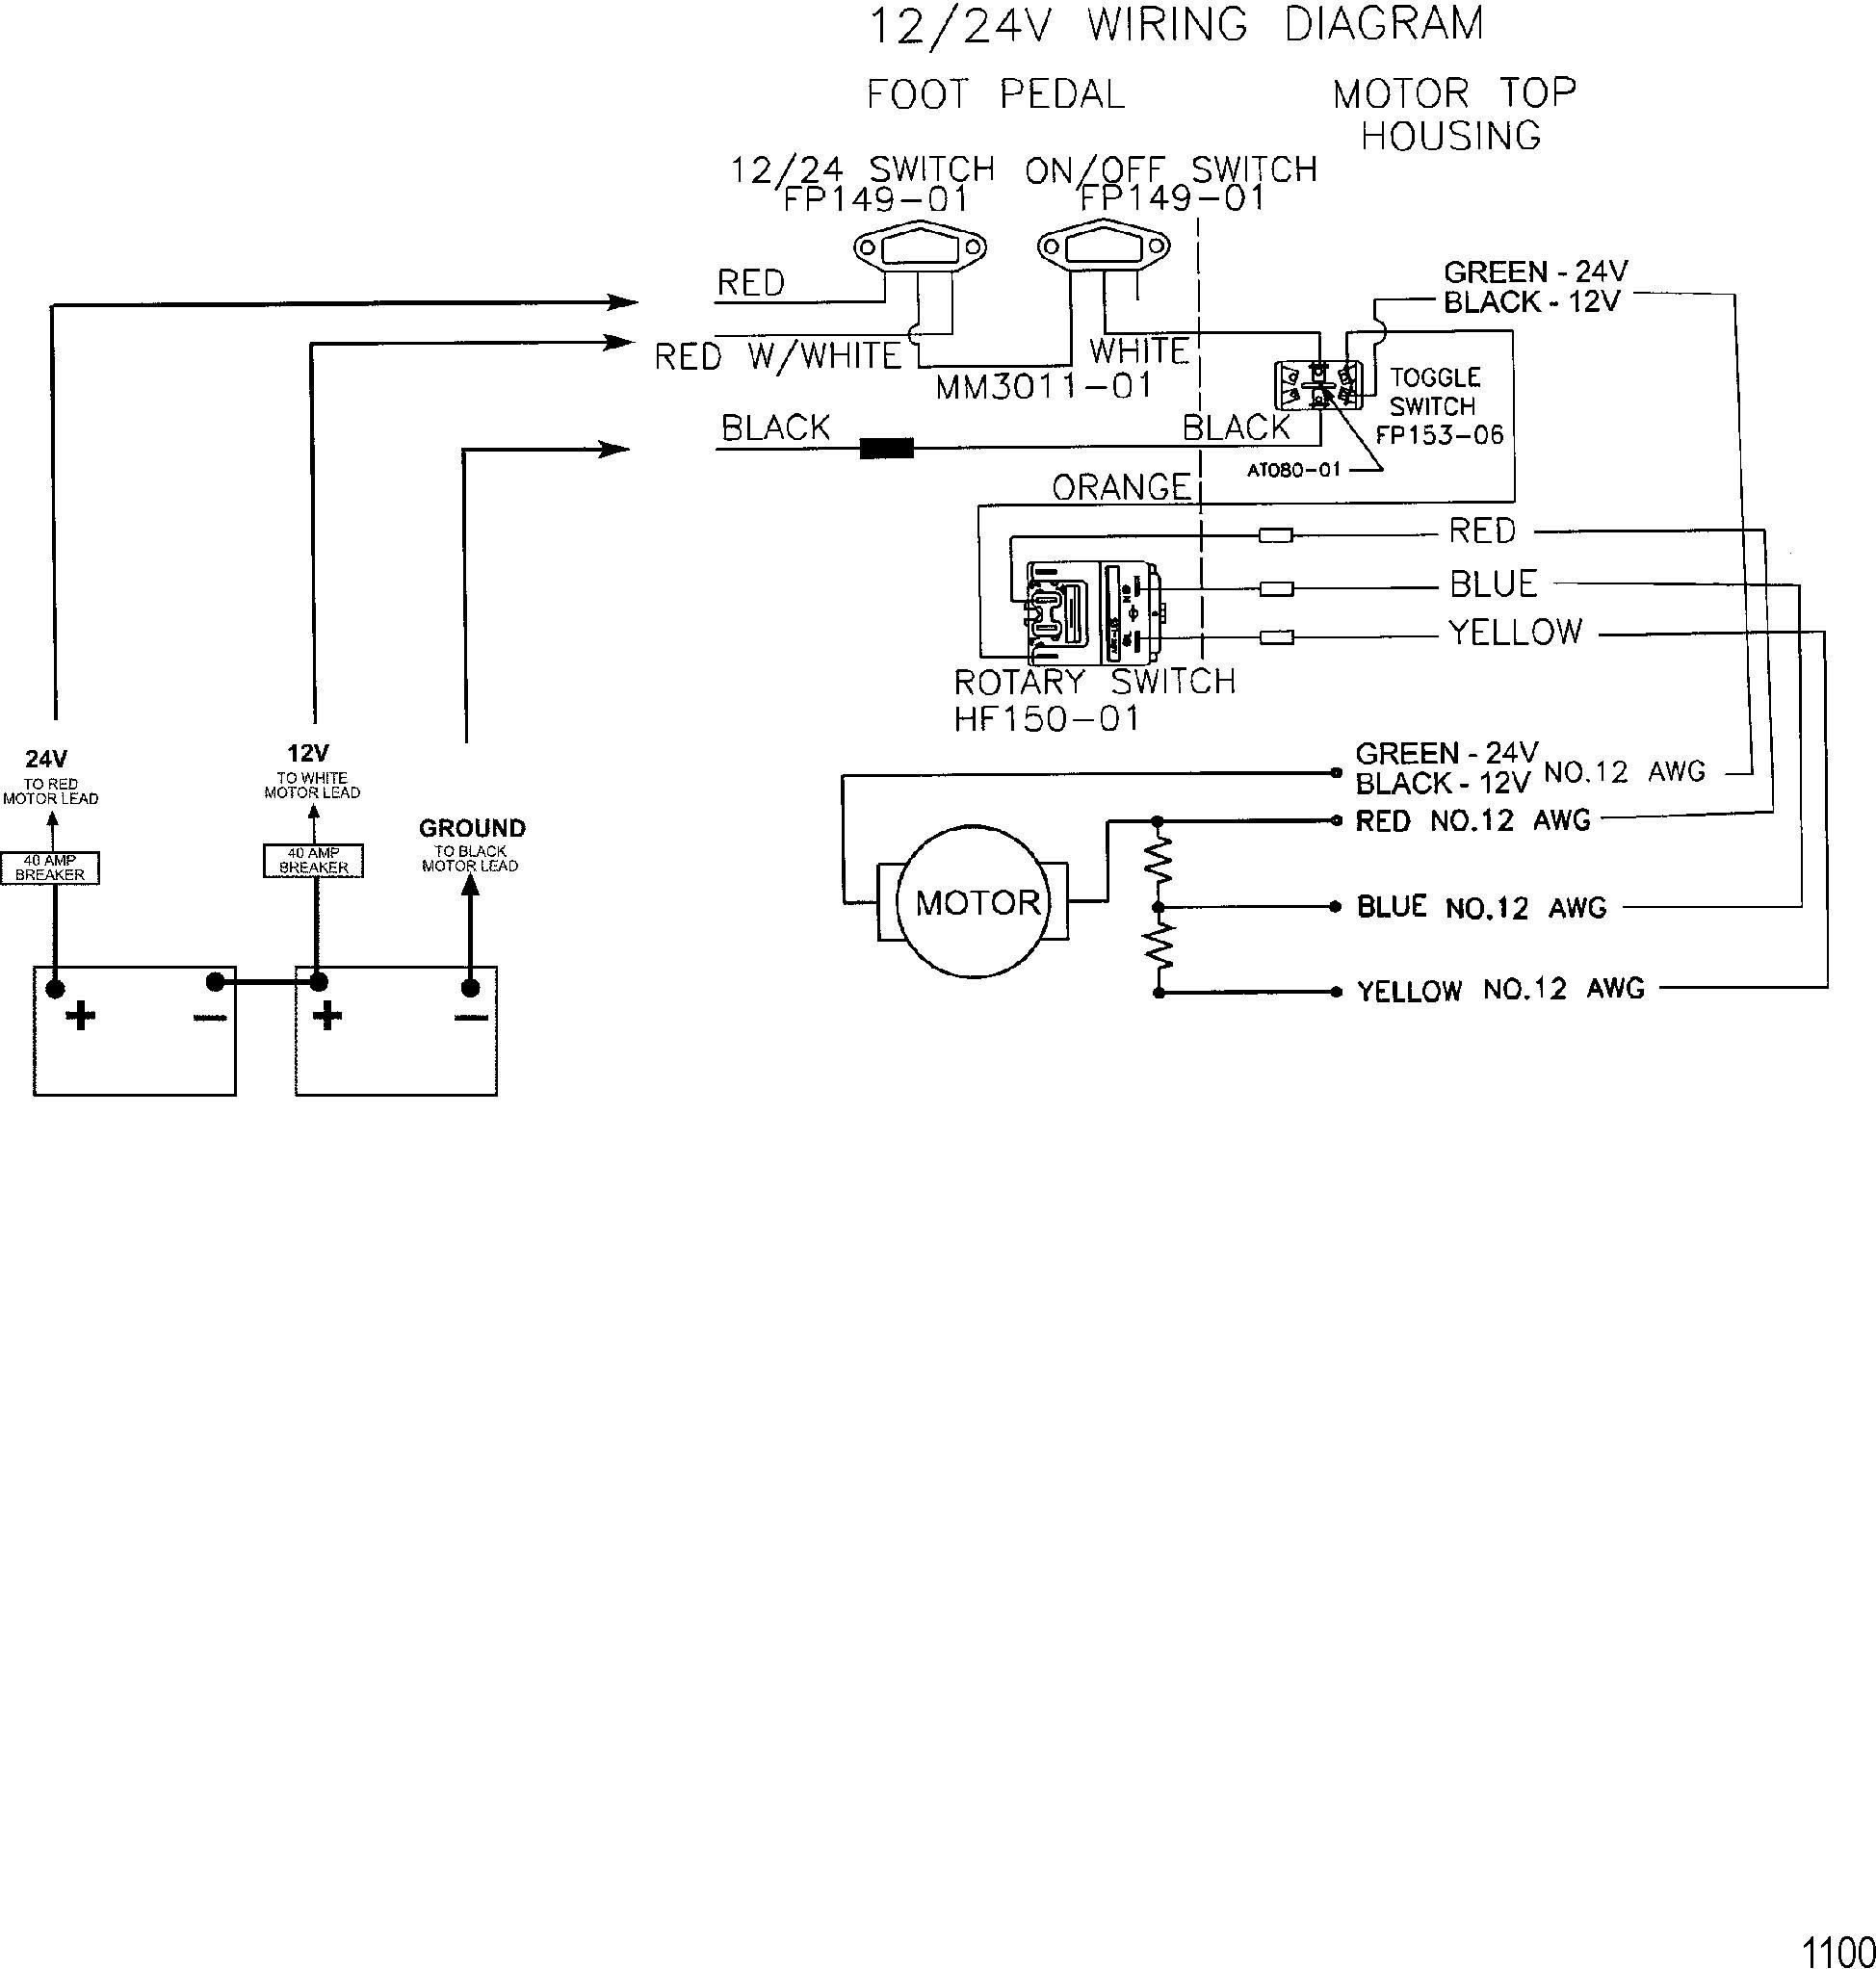 36 Volt Trolling Motor Wiring Diagram | Wiring Diagram - 36 Volt Trolling Motor Wiring Diagram